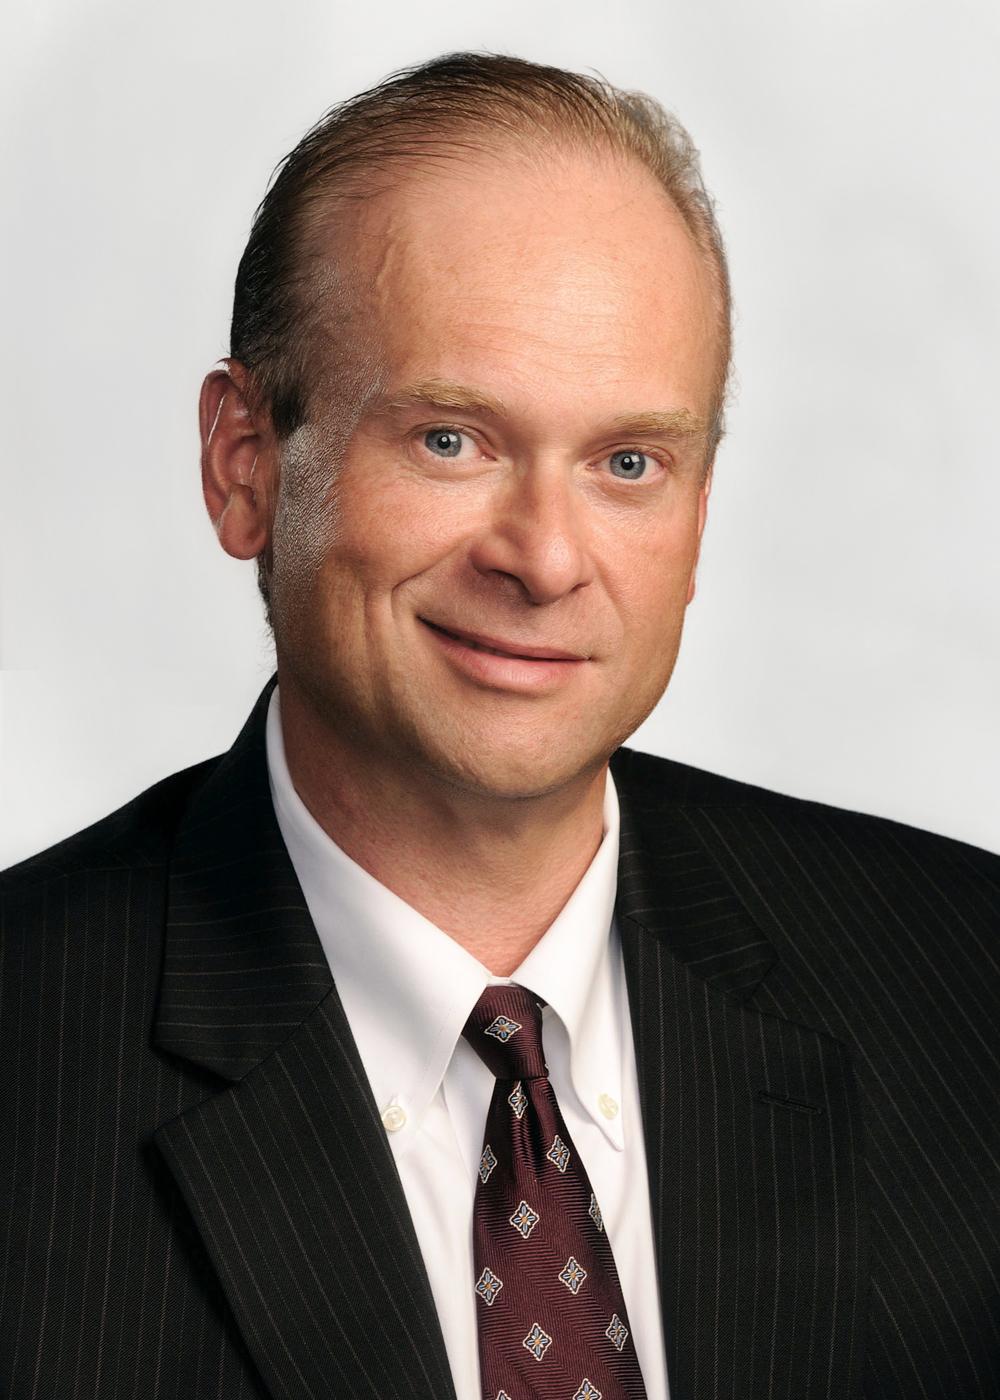 James Loring, Director